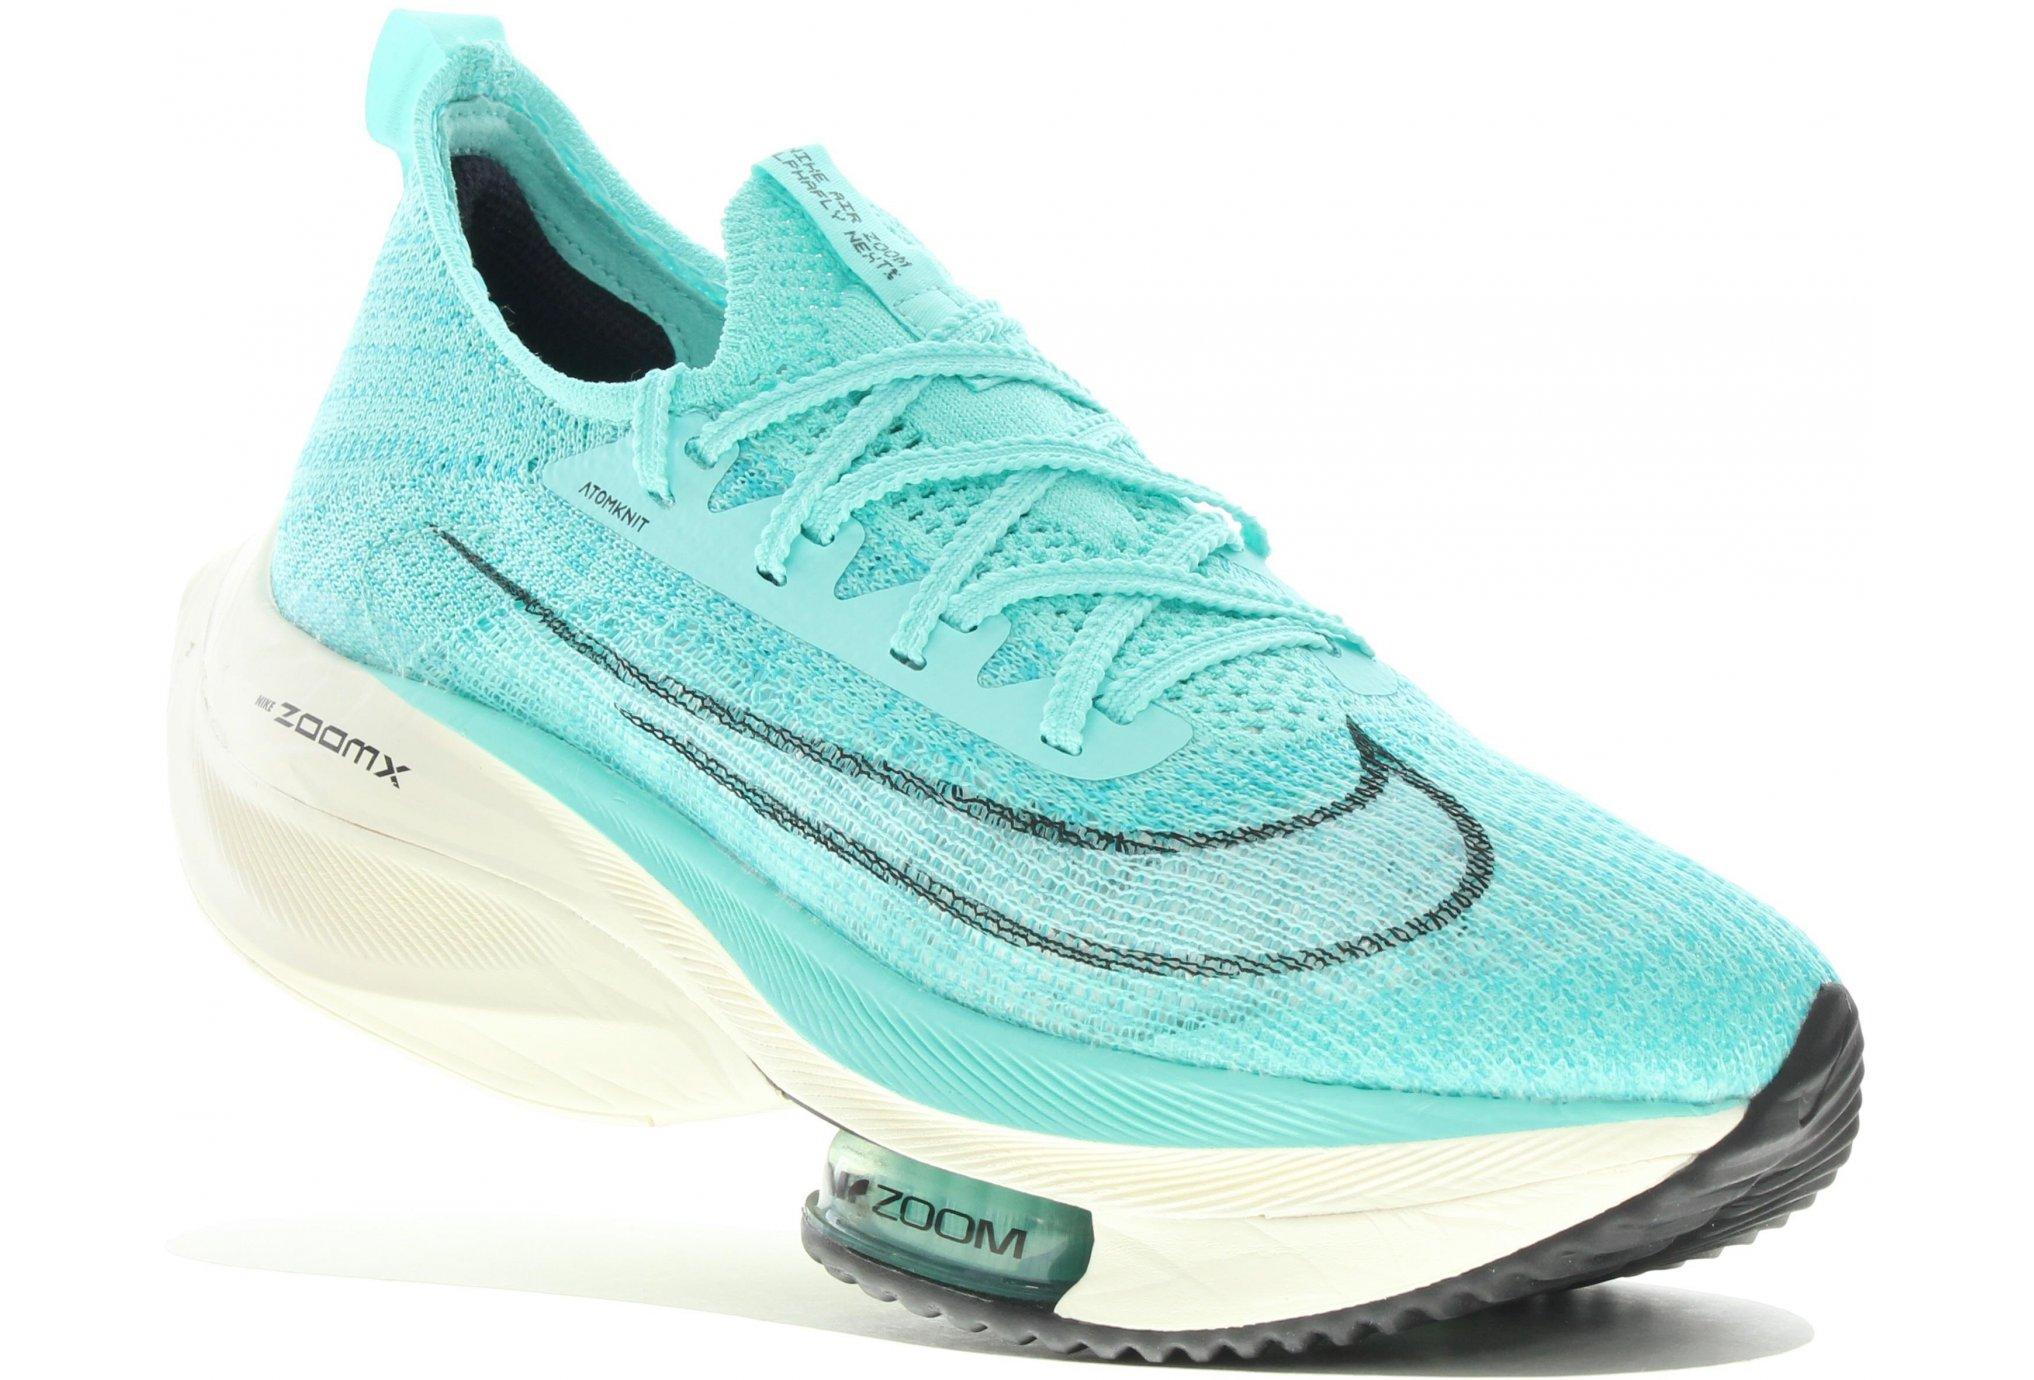 Nike Air Zoom Alphafly Next% W Chaussures running femme